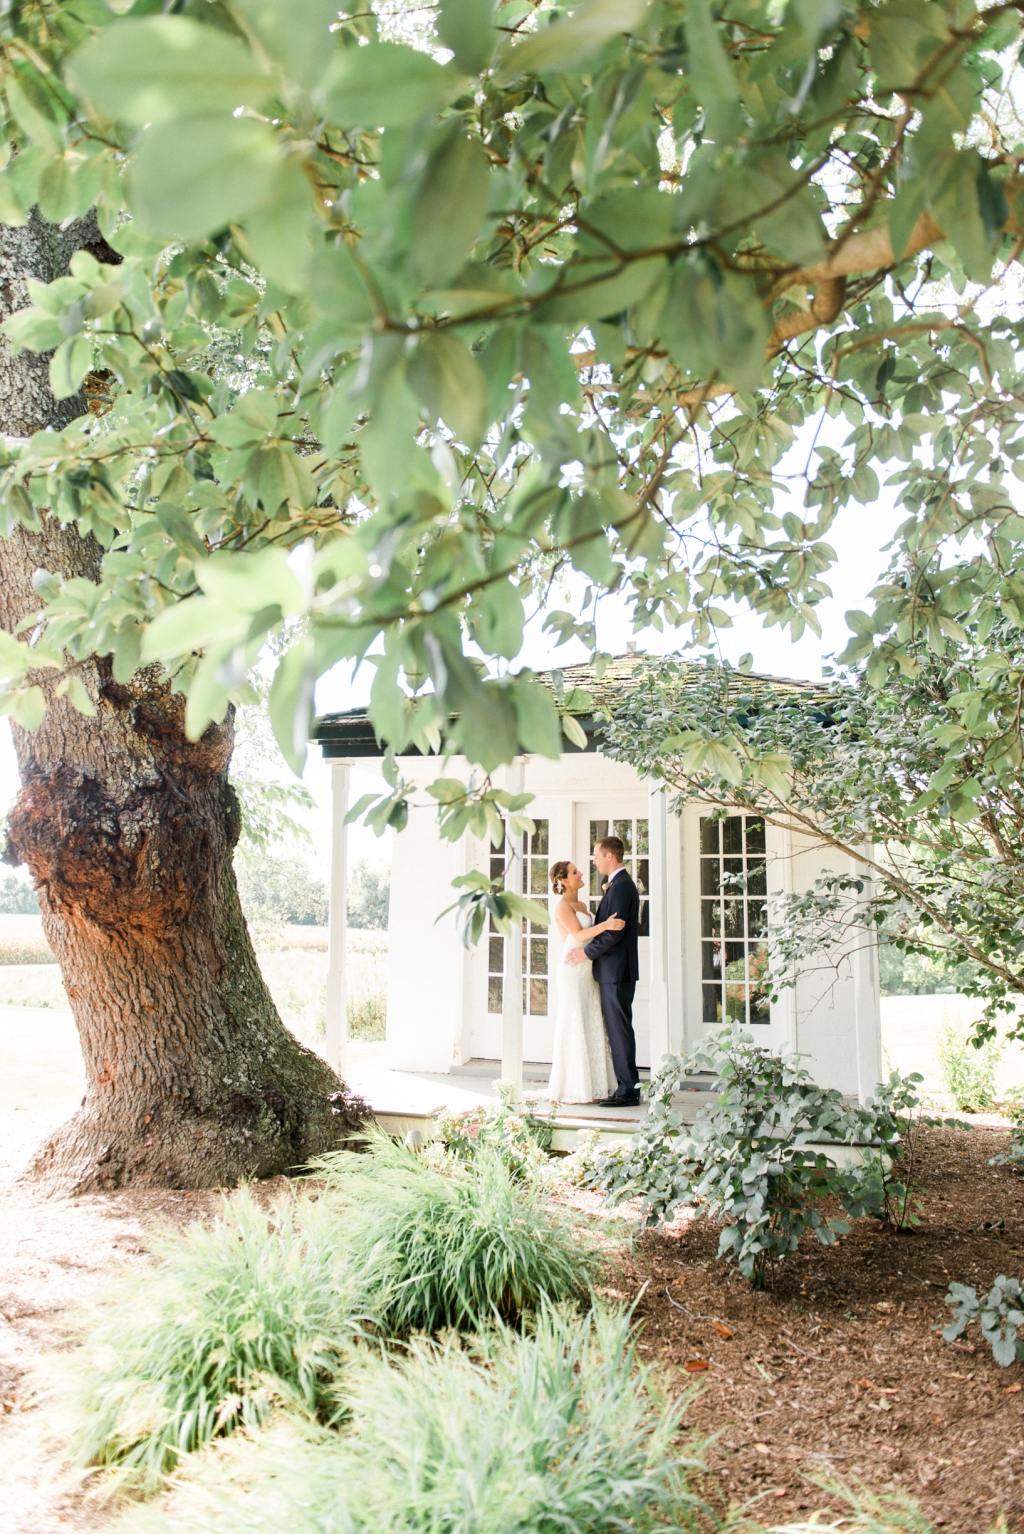 haley-richter-photography-buena-vista-confrence-center-wedding-summer-086